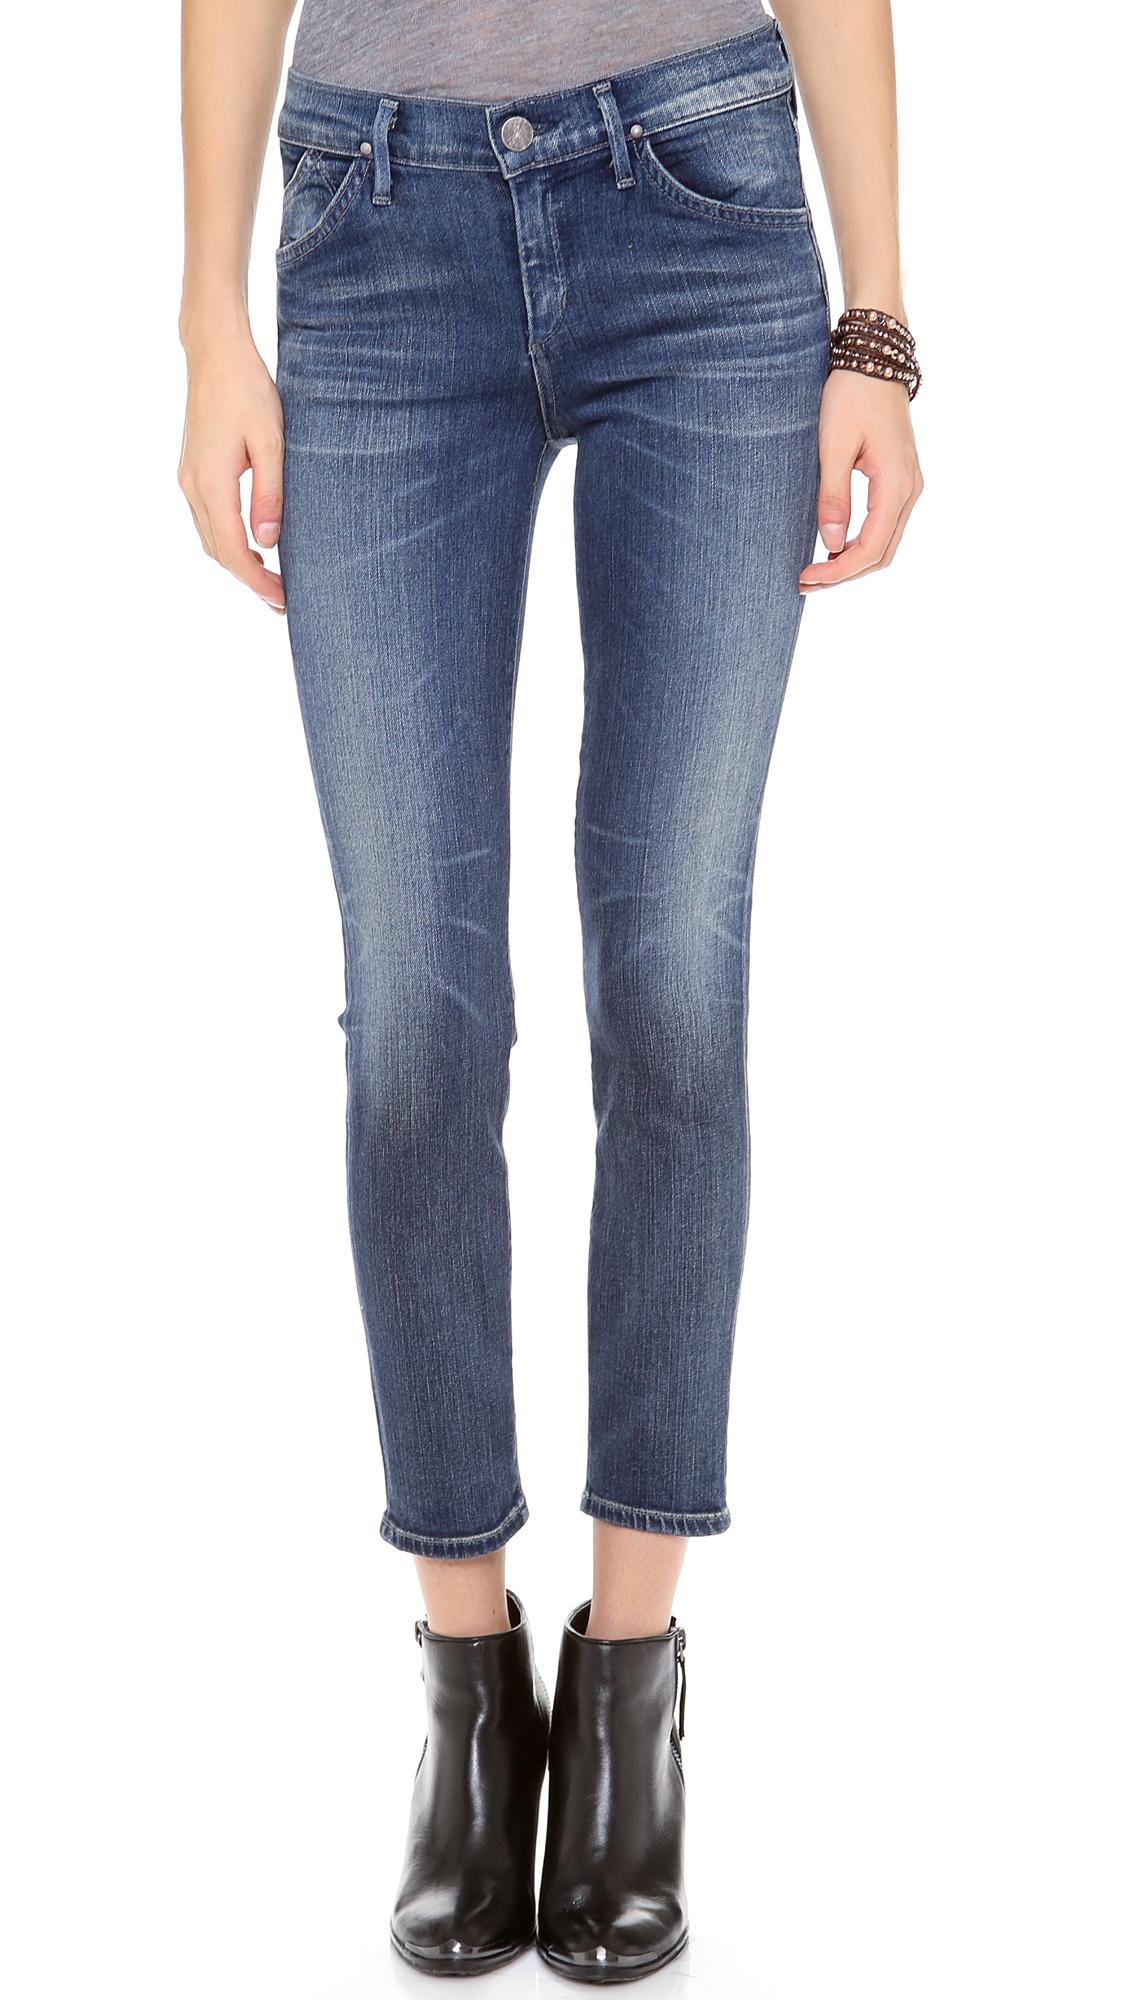 Goldsign Glam Skinny Crop Jean in Blue